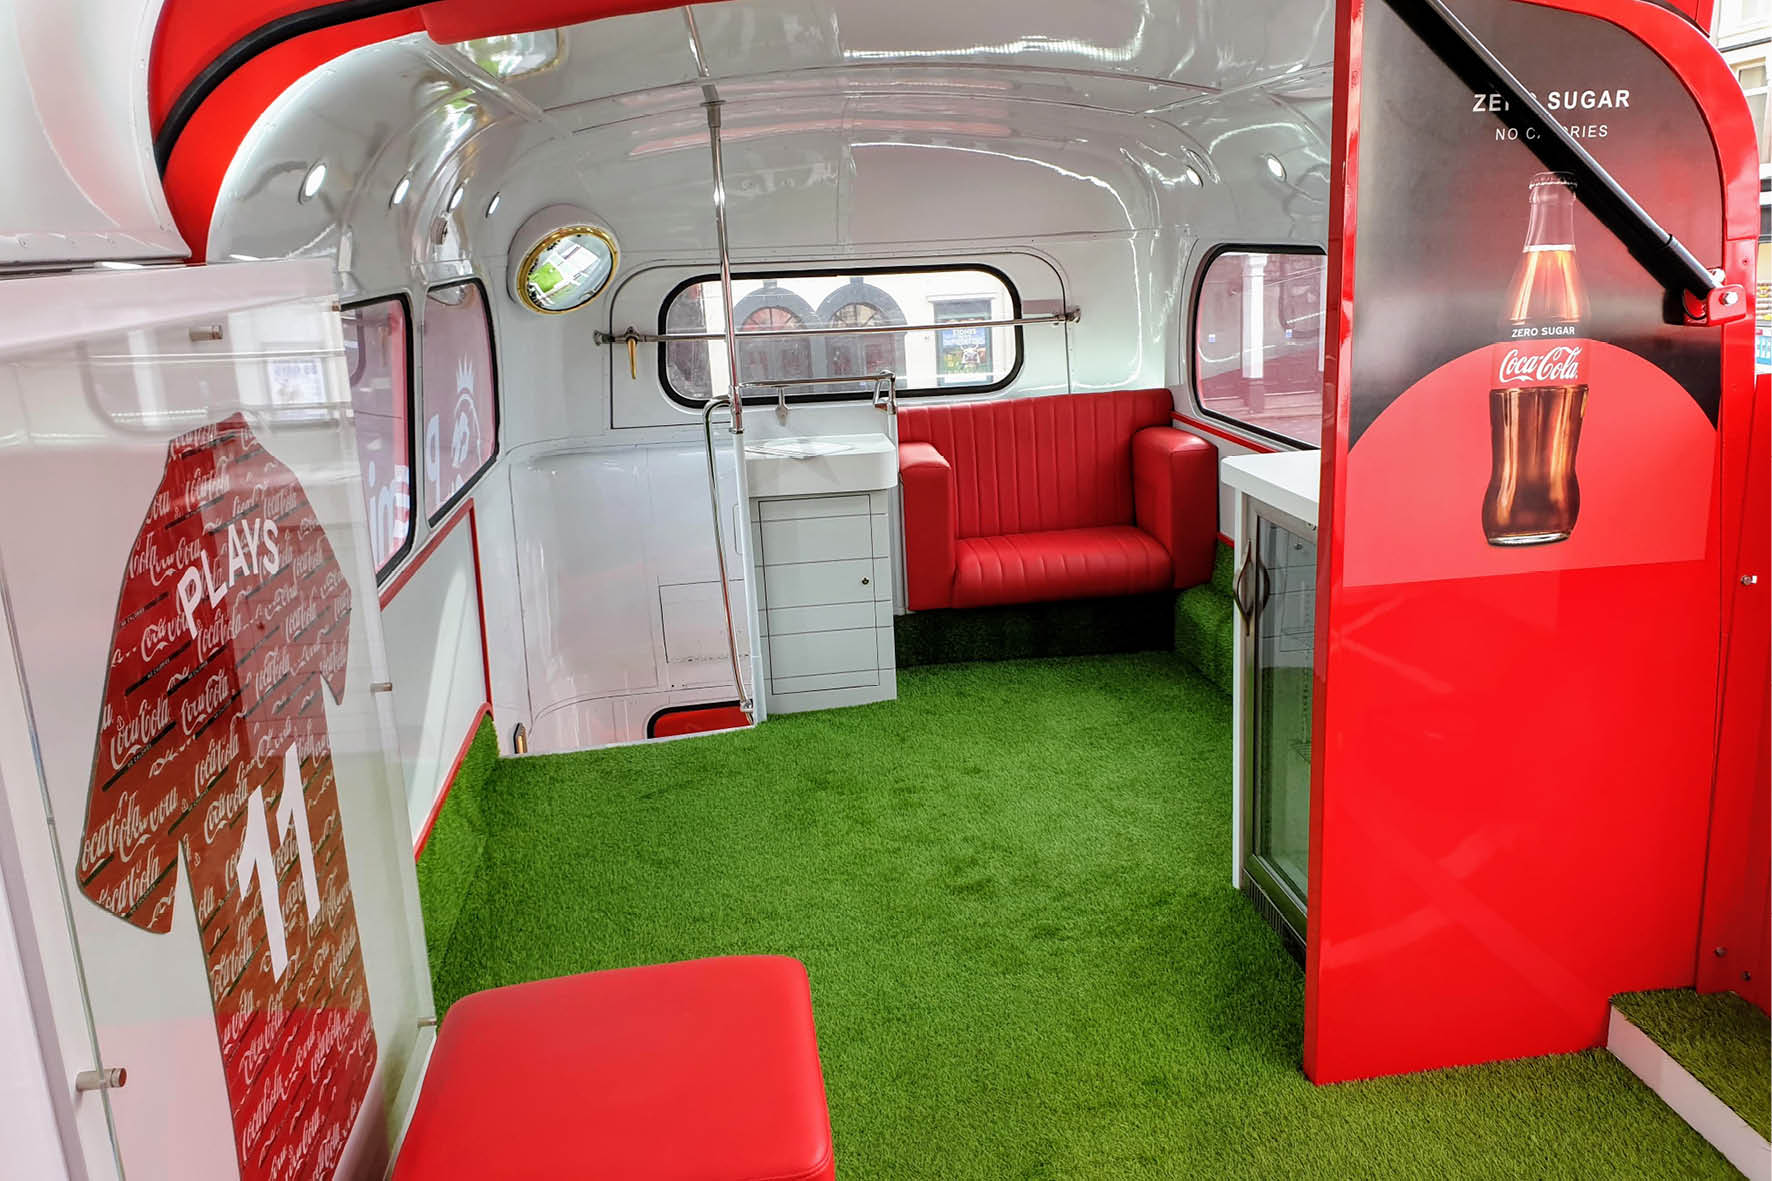 bus_business_2019_coca_cola_5.jpg